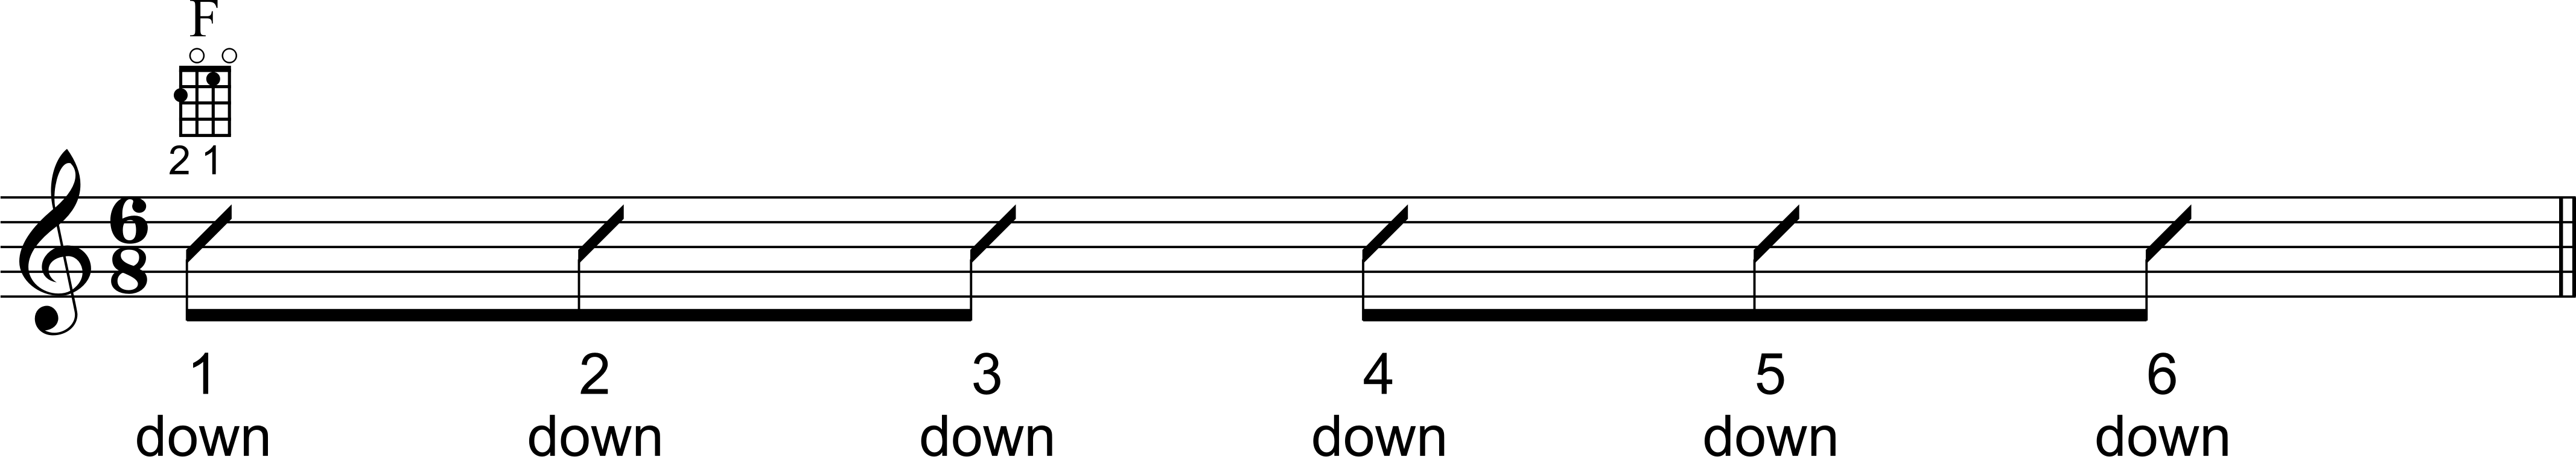 Down Strumming Pattern